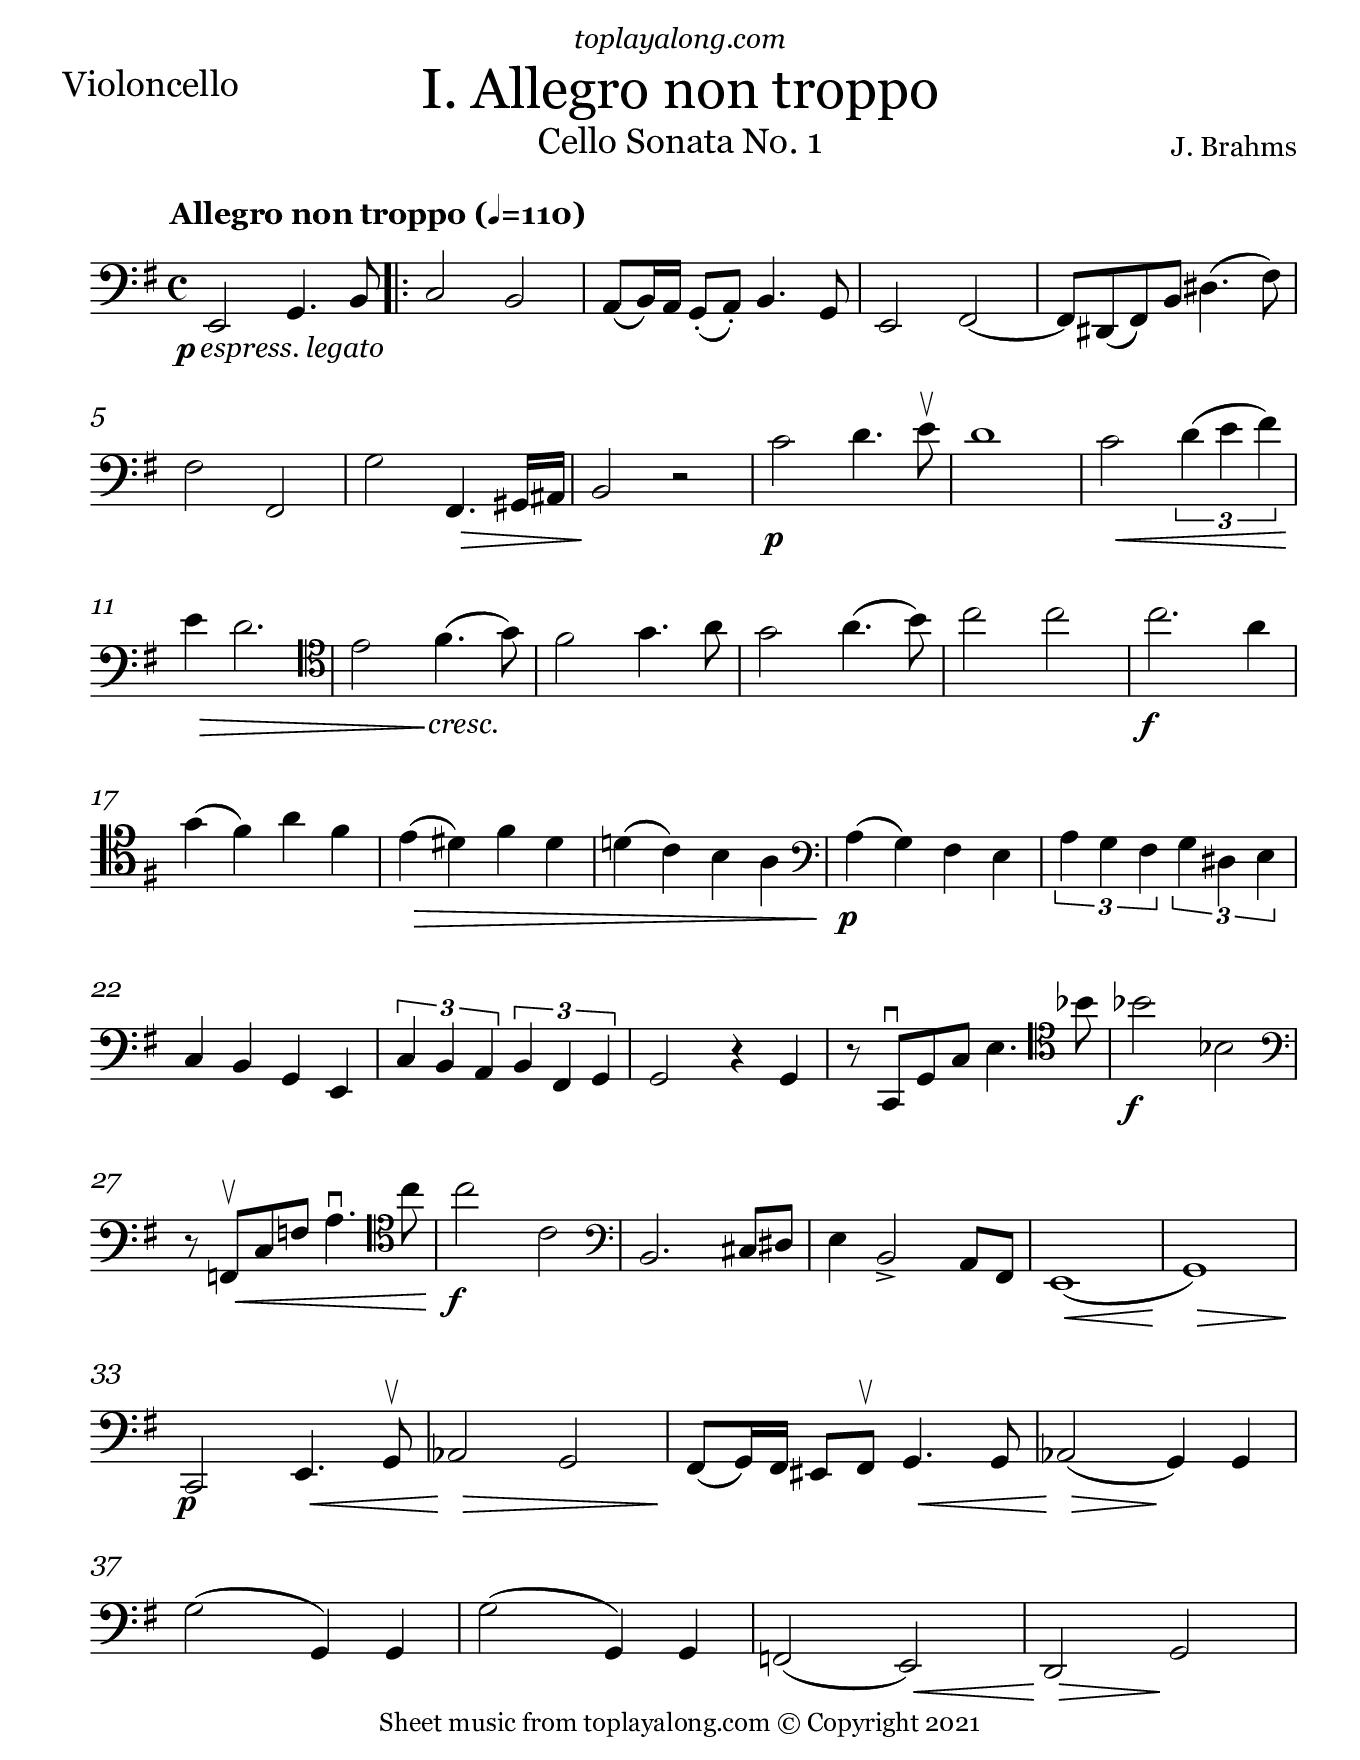 Cello Sonata No. 1 (I. Allegro) by Brahms. Sheet music for Cello, page 1.